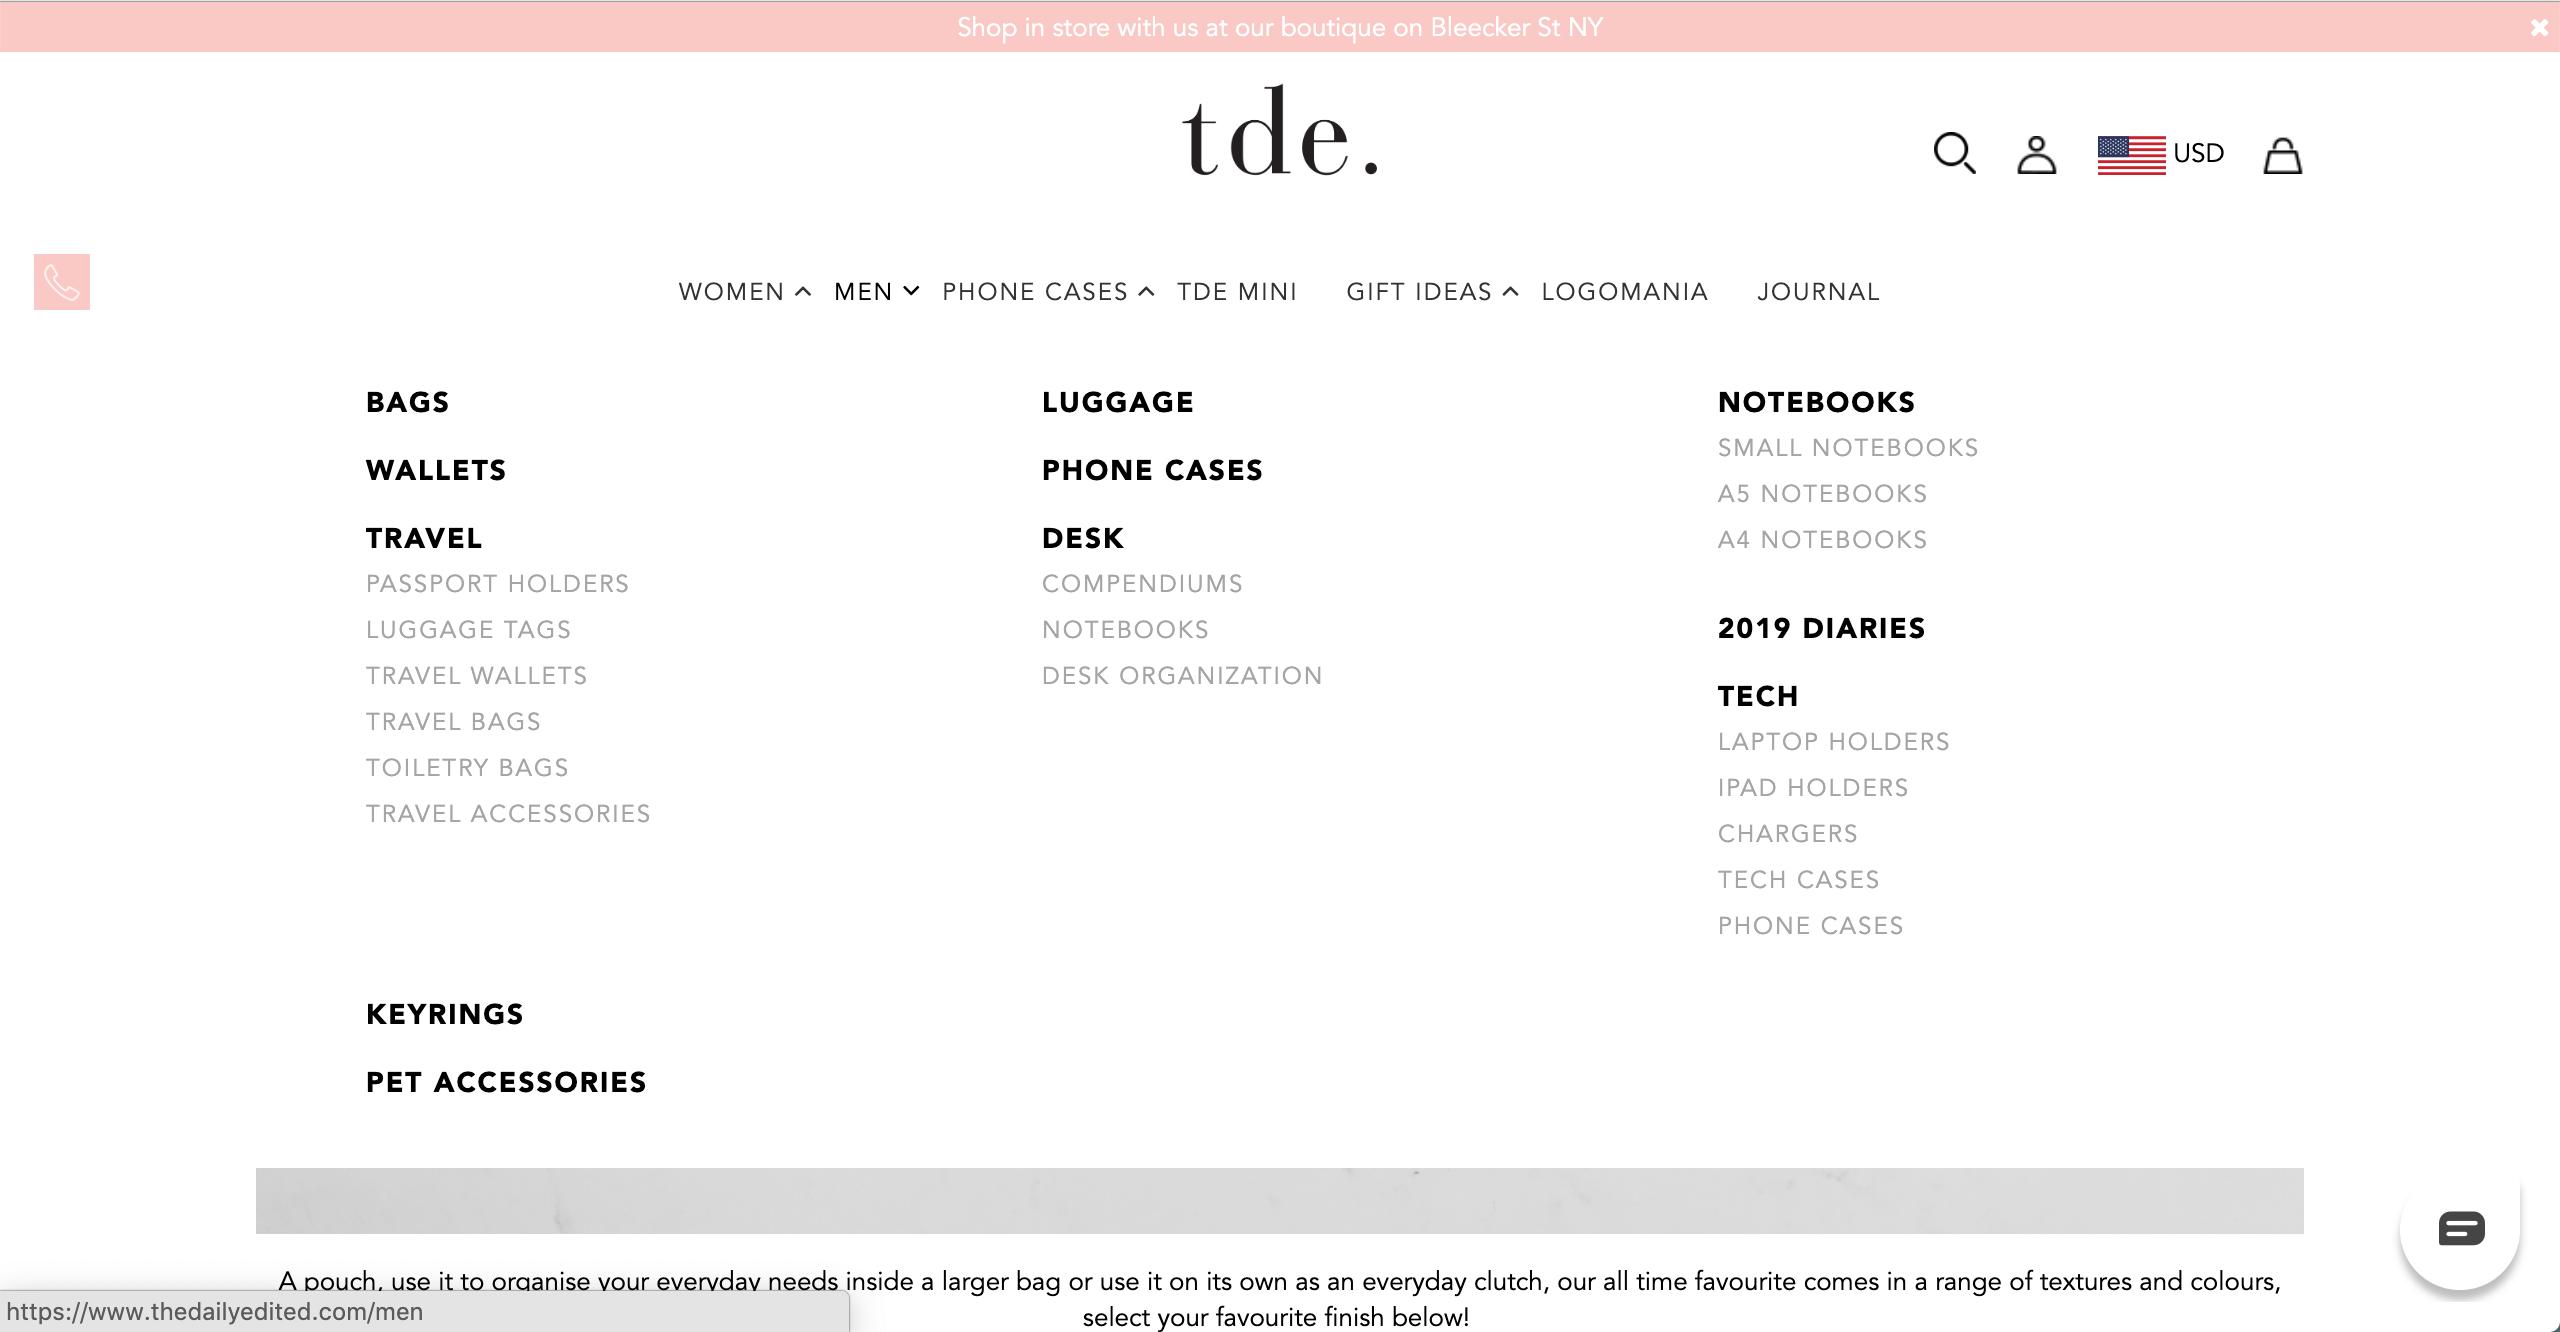 TDE men's products